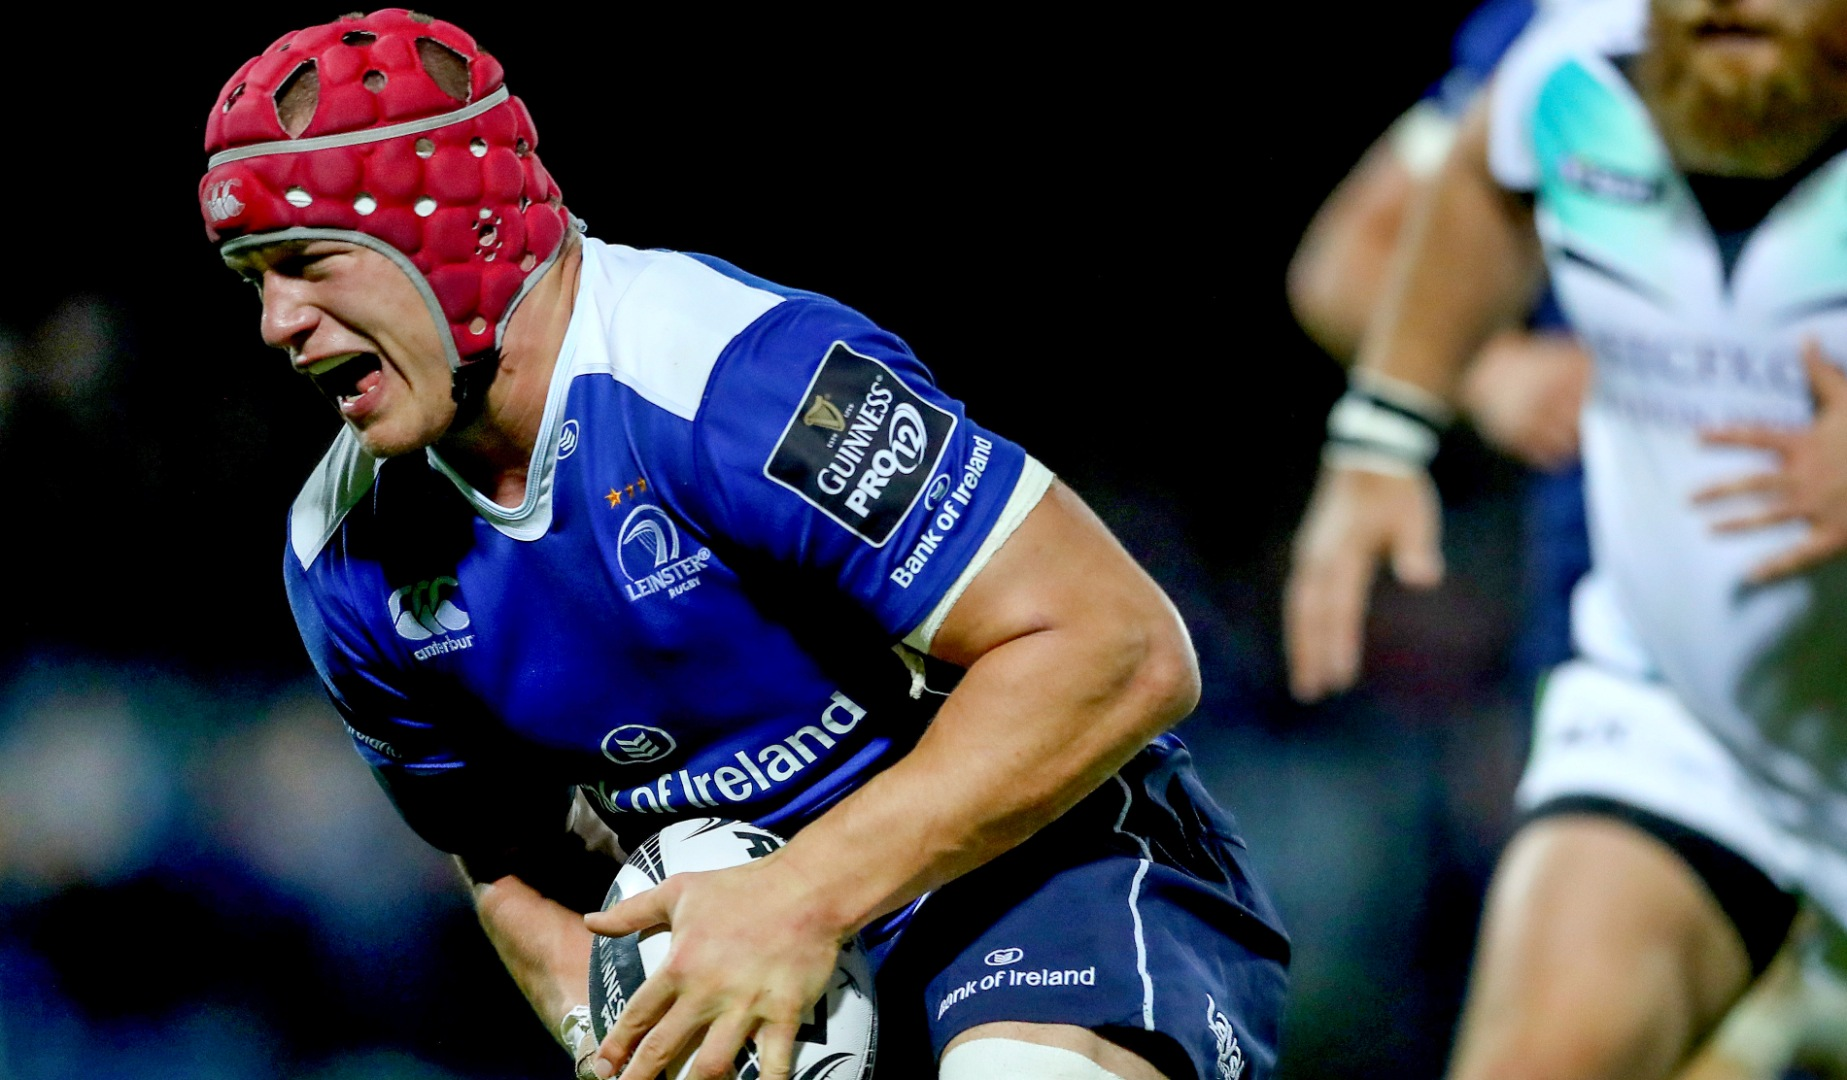 LionsWatch: van der Flier and Sexton impress for Leinster